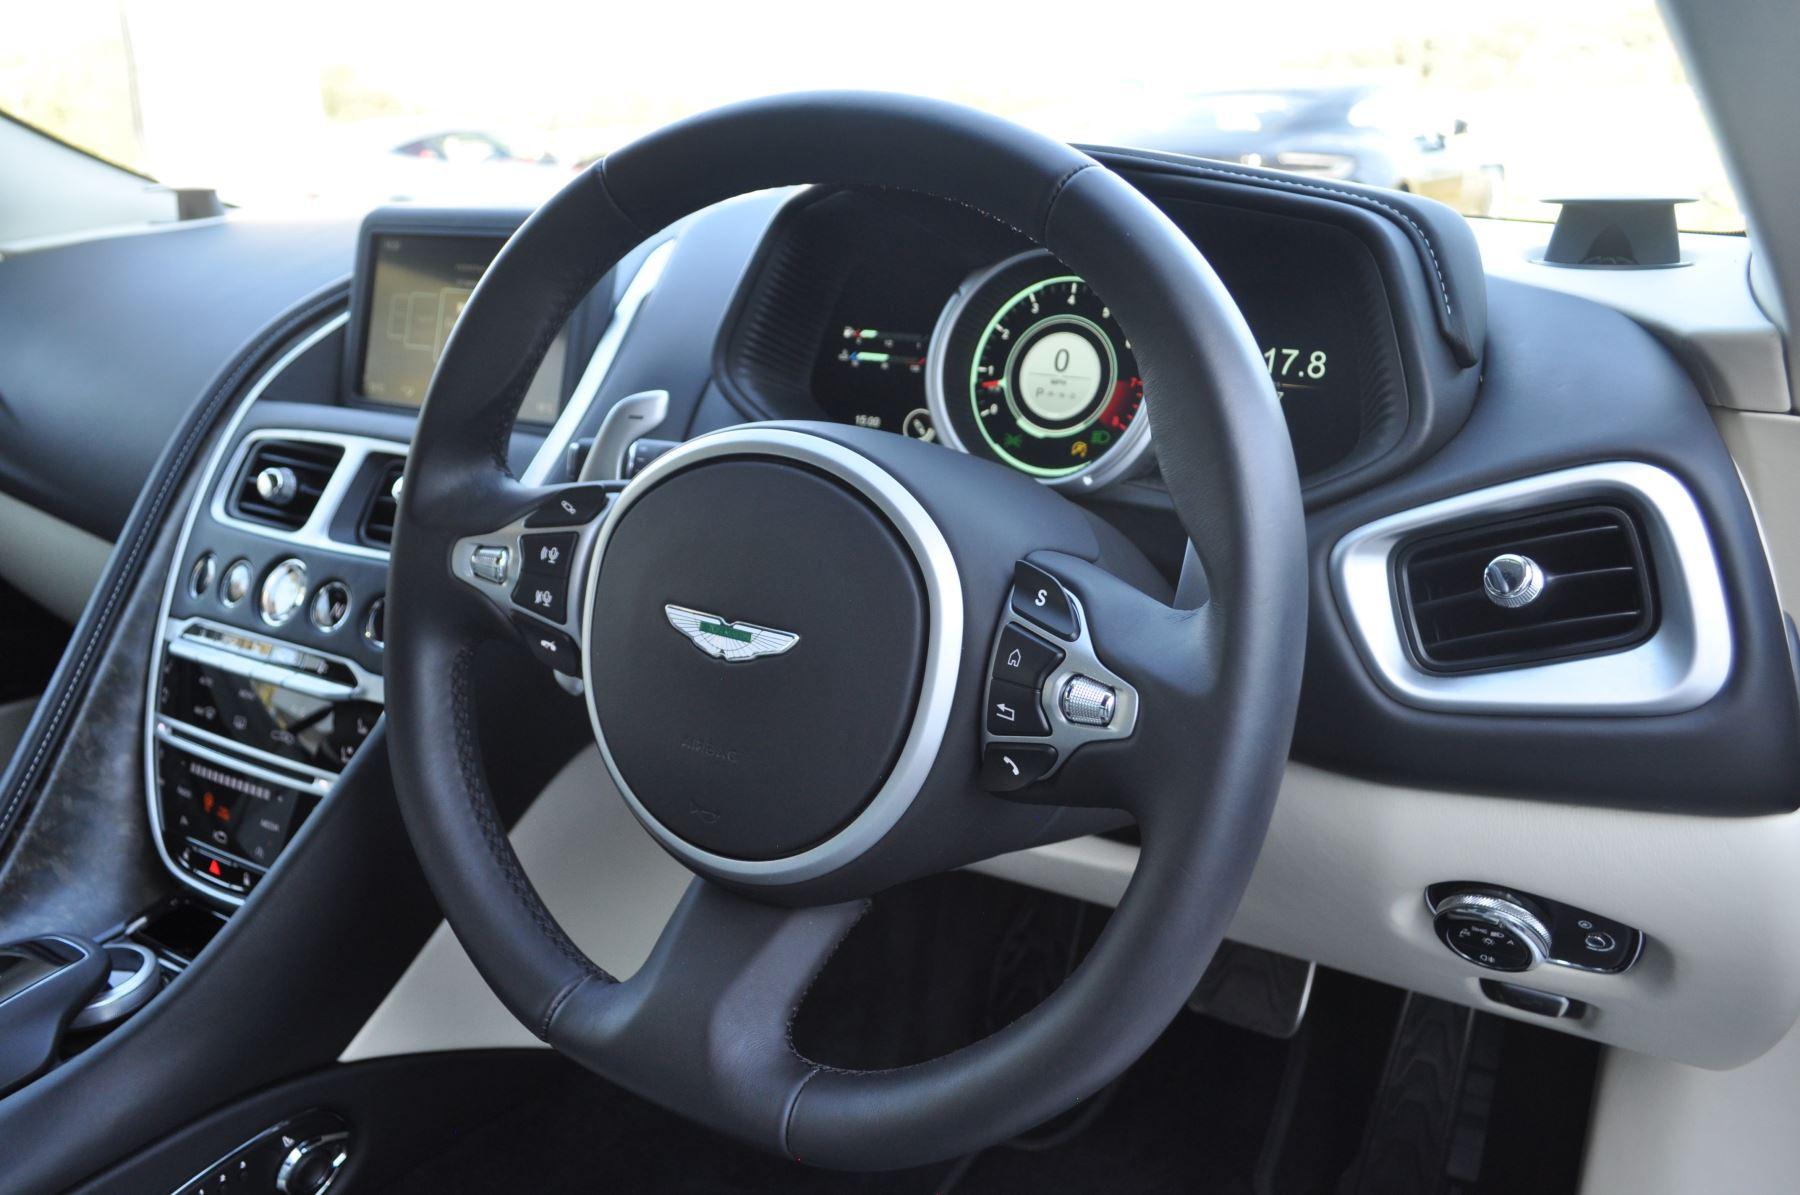 Aston Martin DB11 V12 2dr Touchtronic image 21